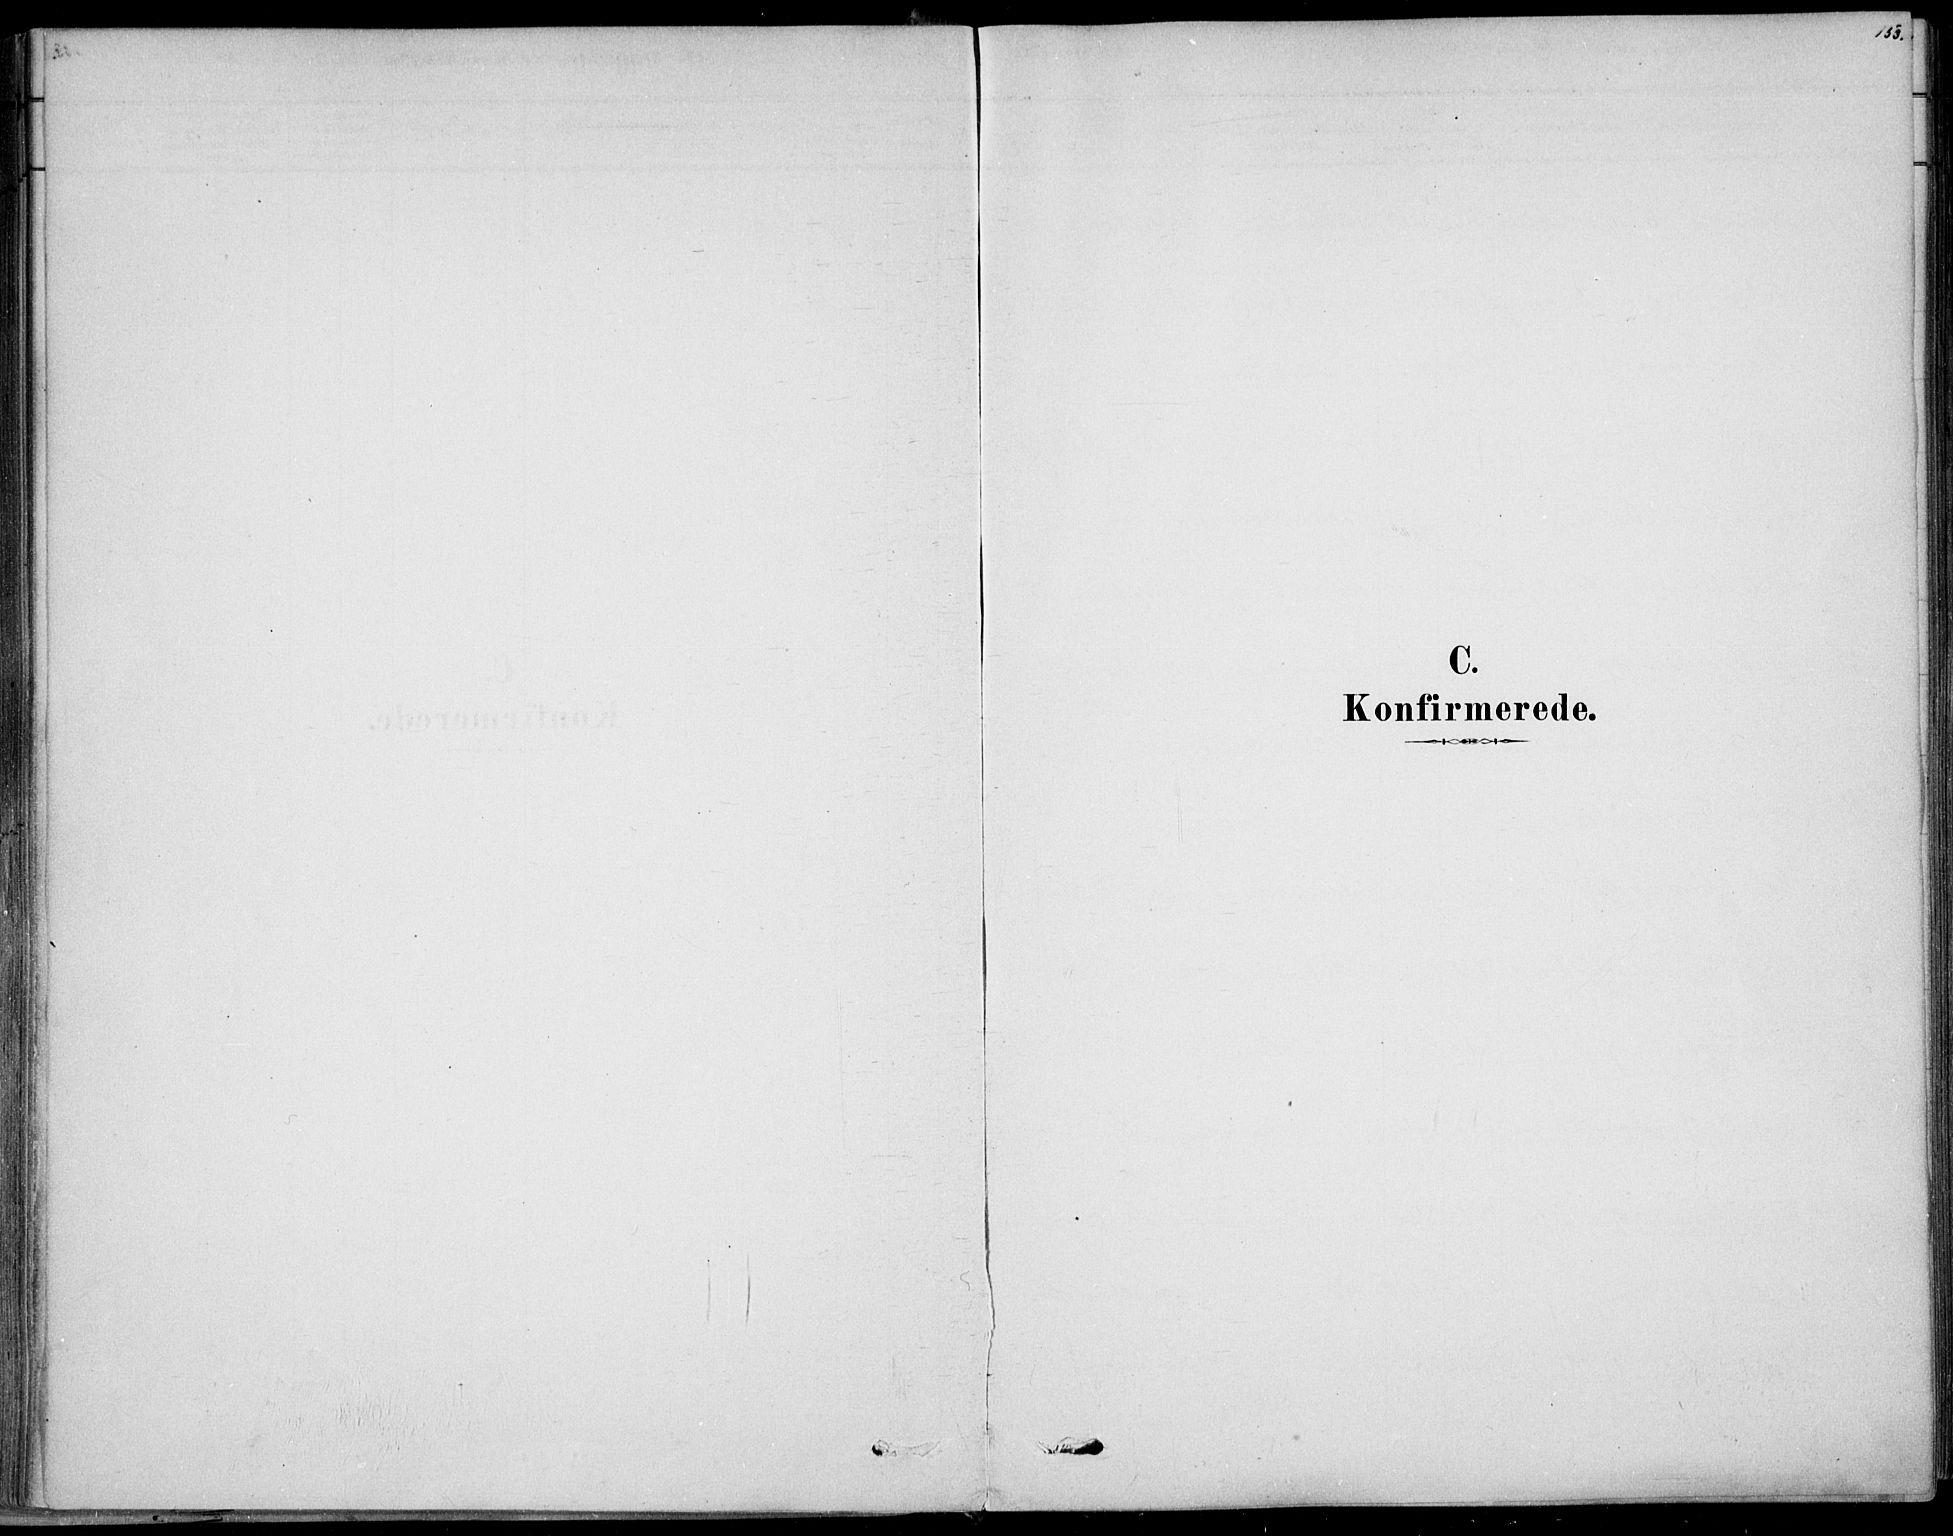 SAKO, Sem kirkebøker, F/Fb/L0004: Parish register (official) no. II 4, 1878-1891, p. 153